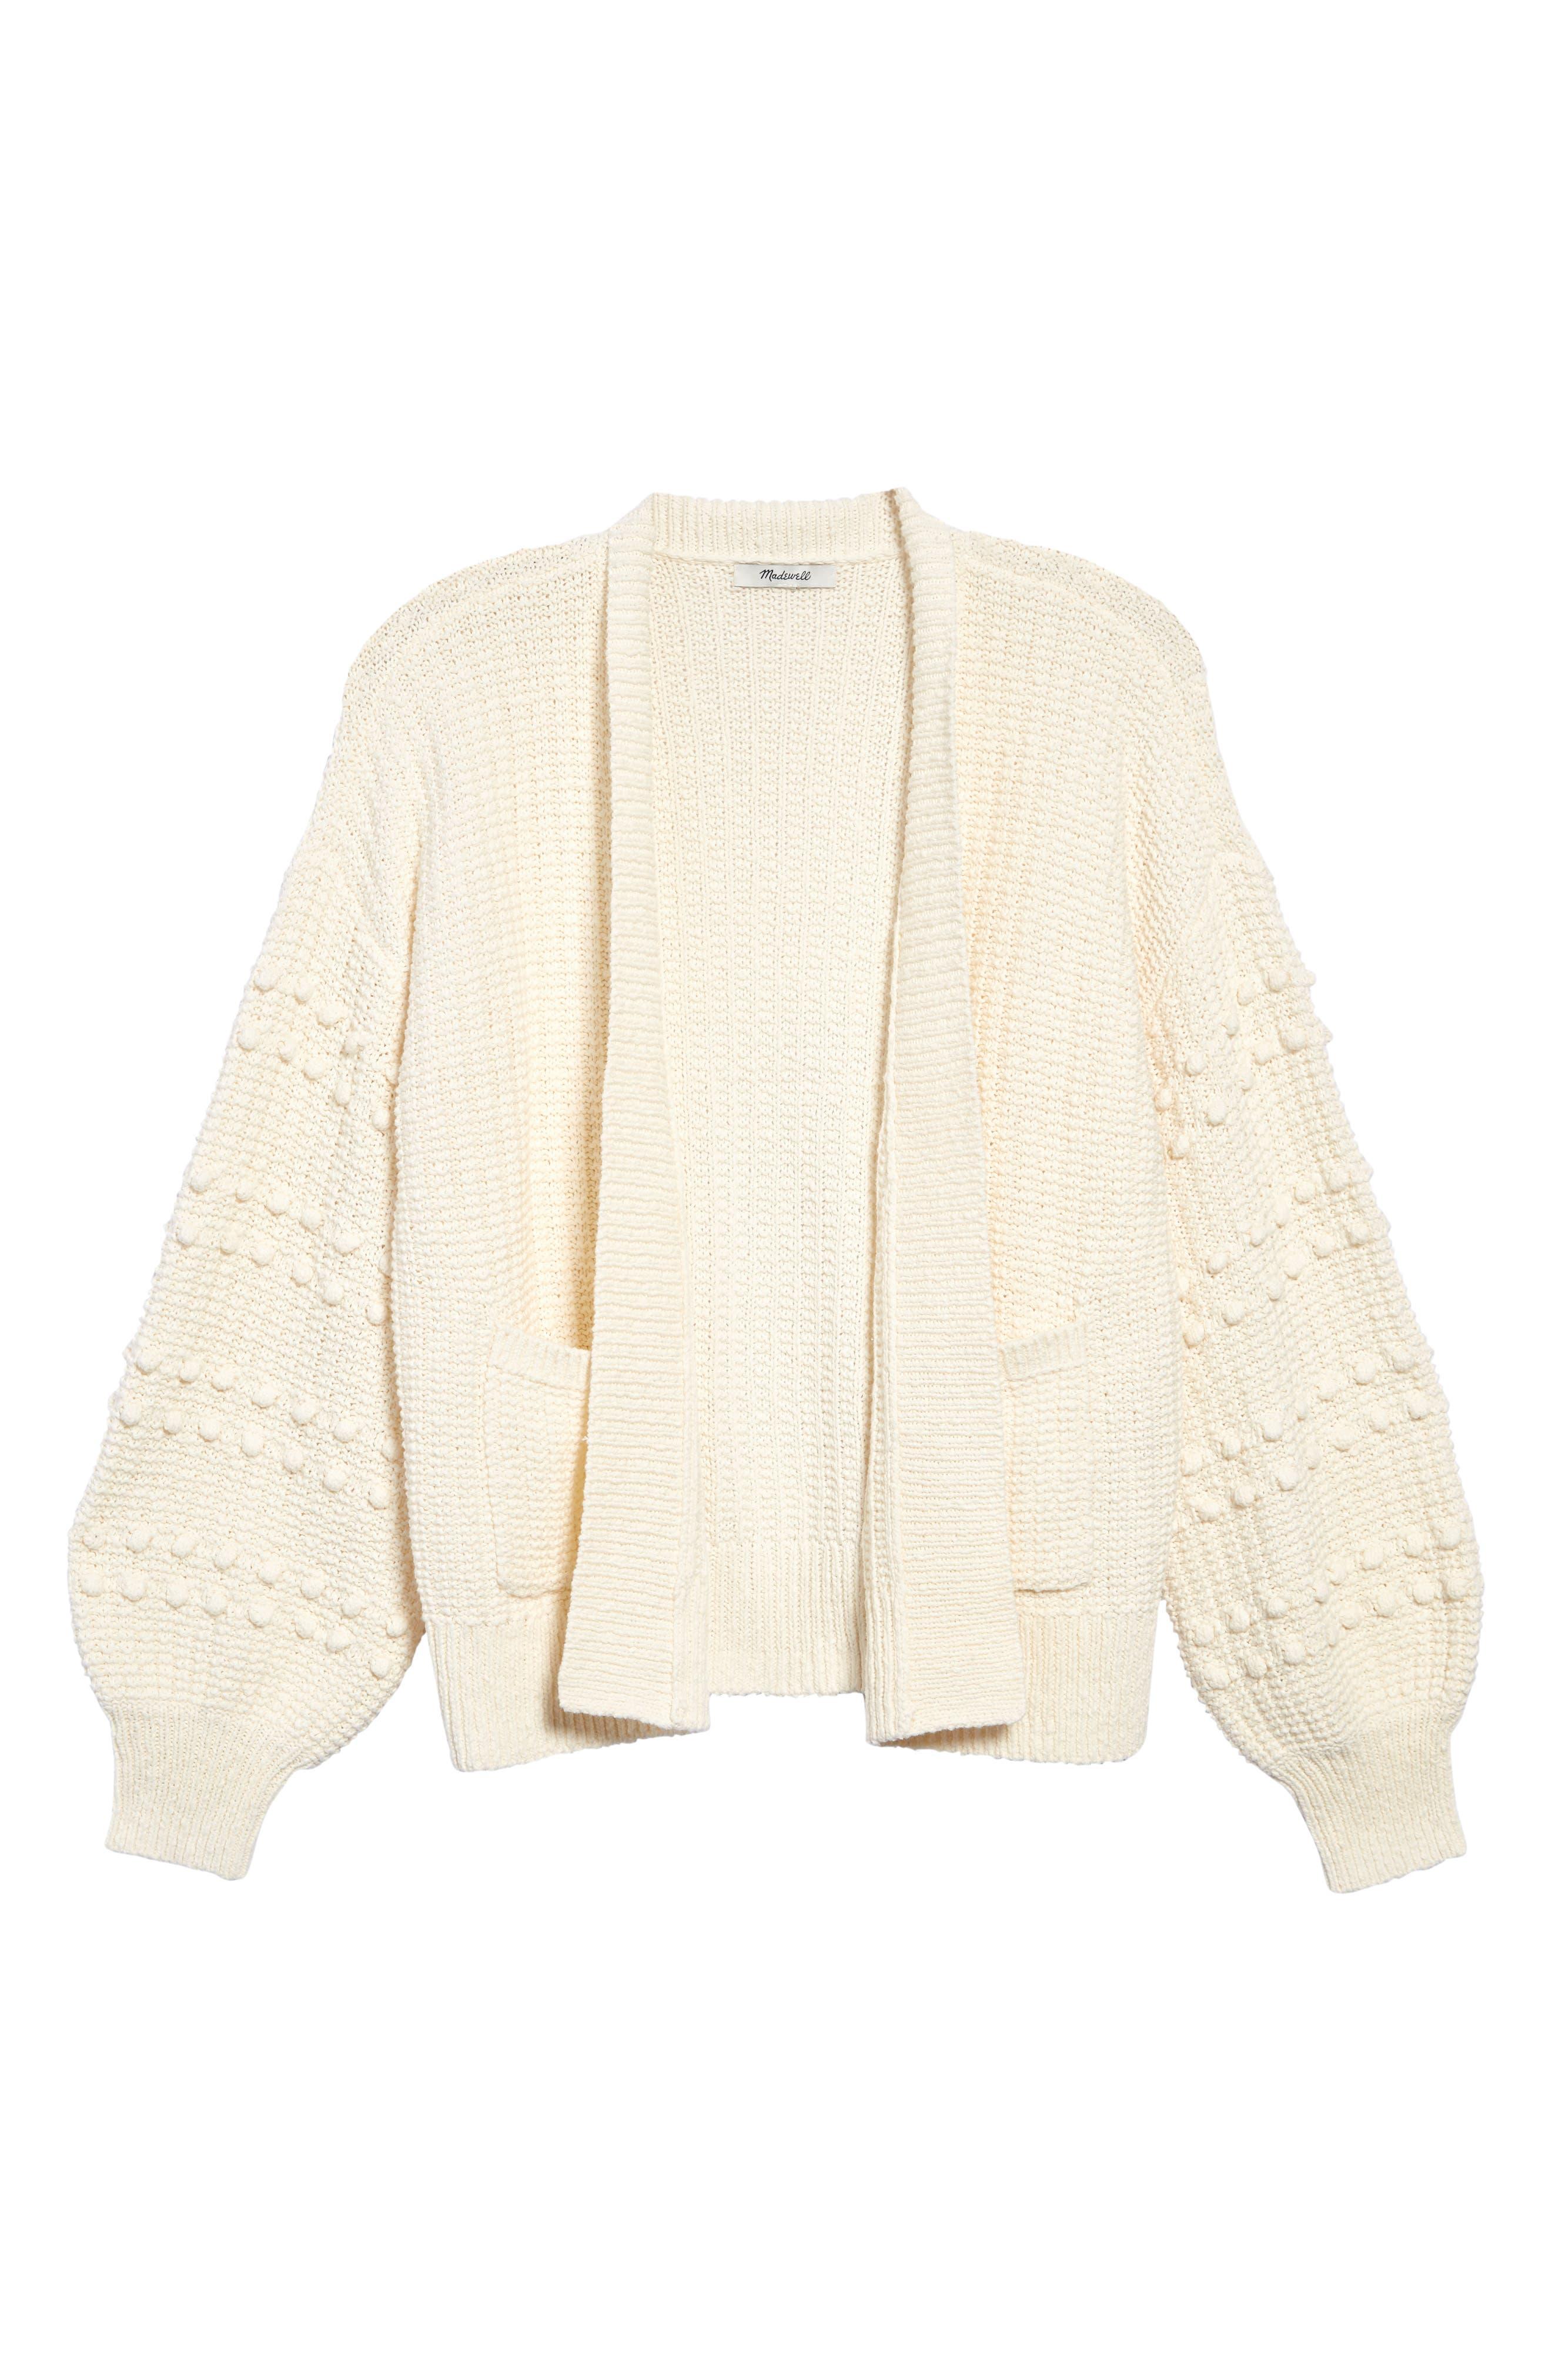 Madewell Bobble Cardigan Sweater (Regular & Plus Size)